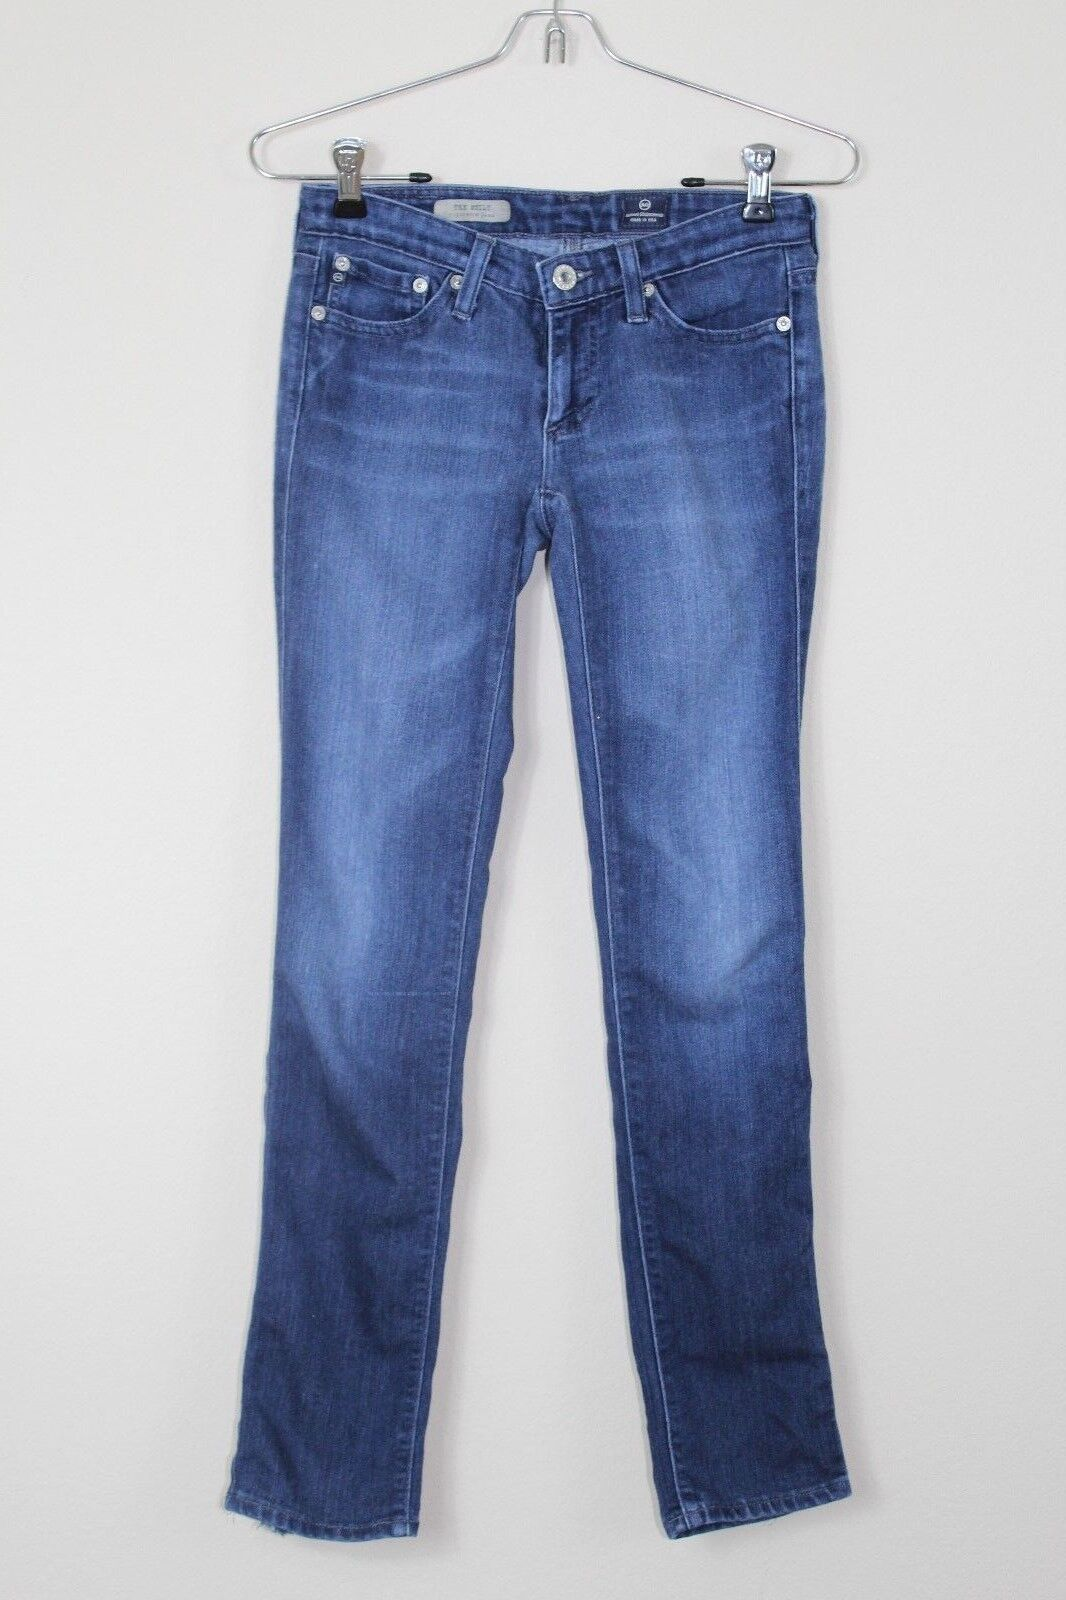 AG Adriano goldschmied Stilt Cigarette Jeans Size 24R